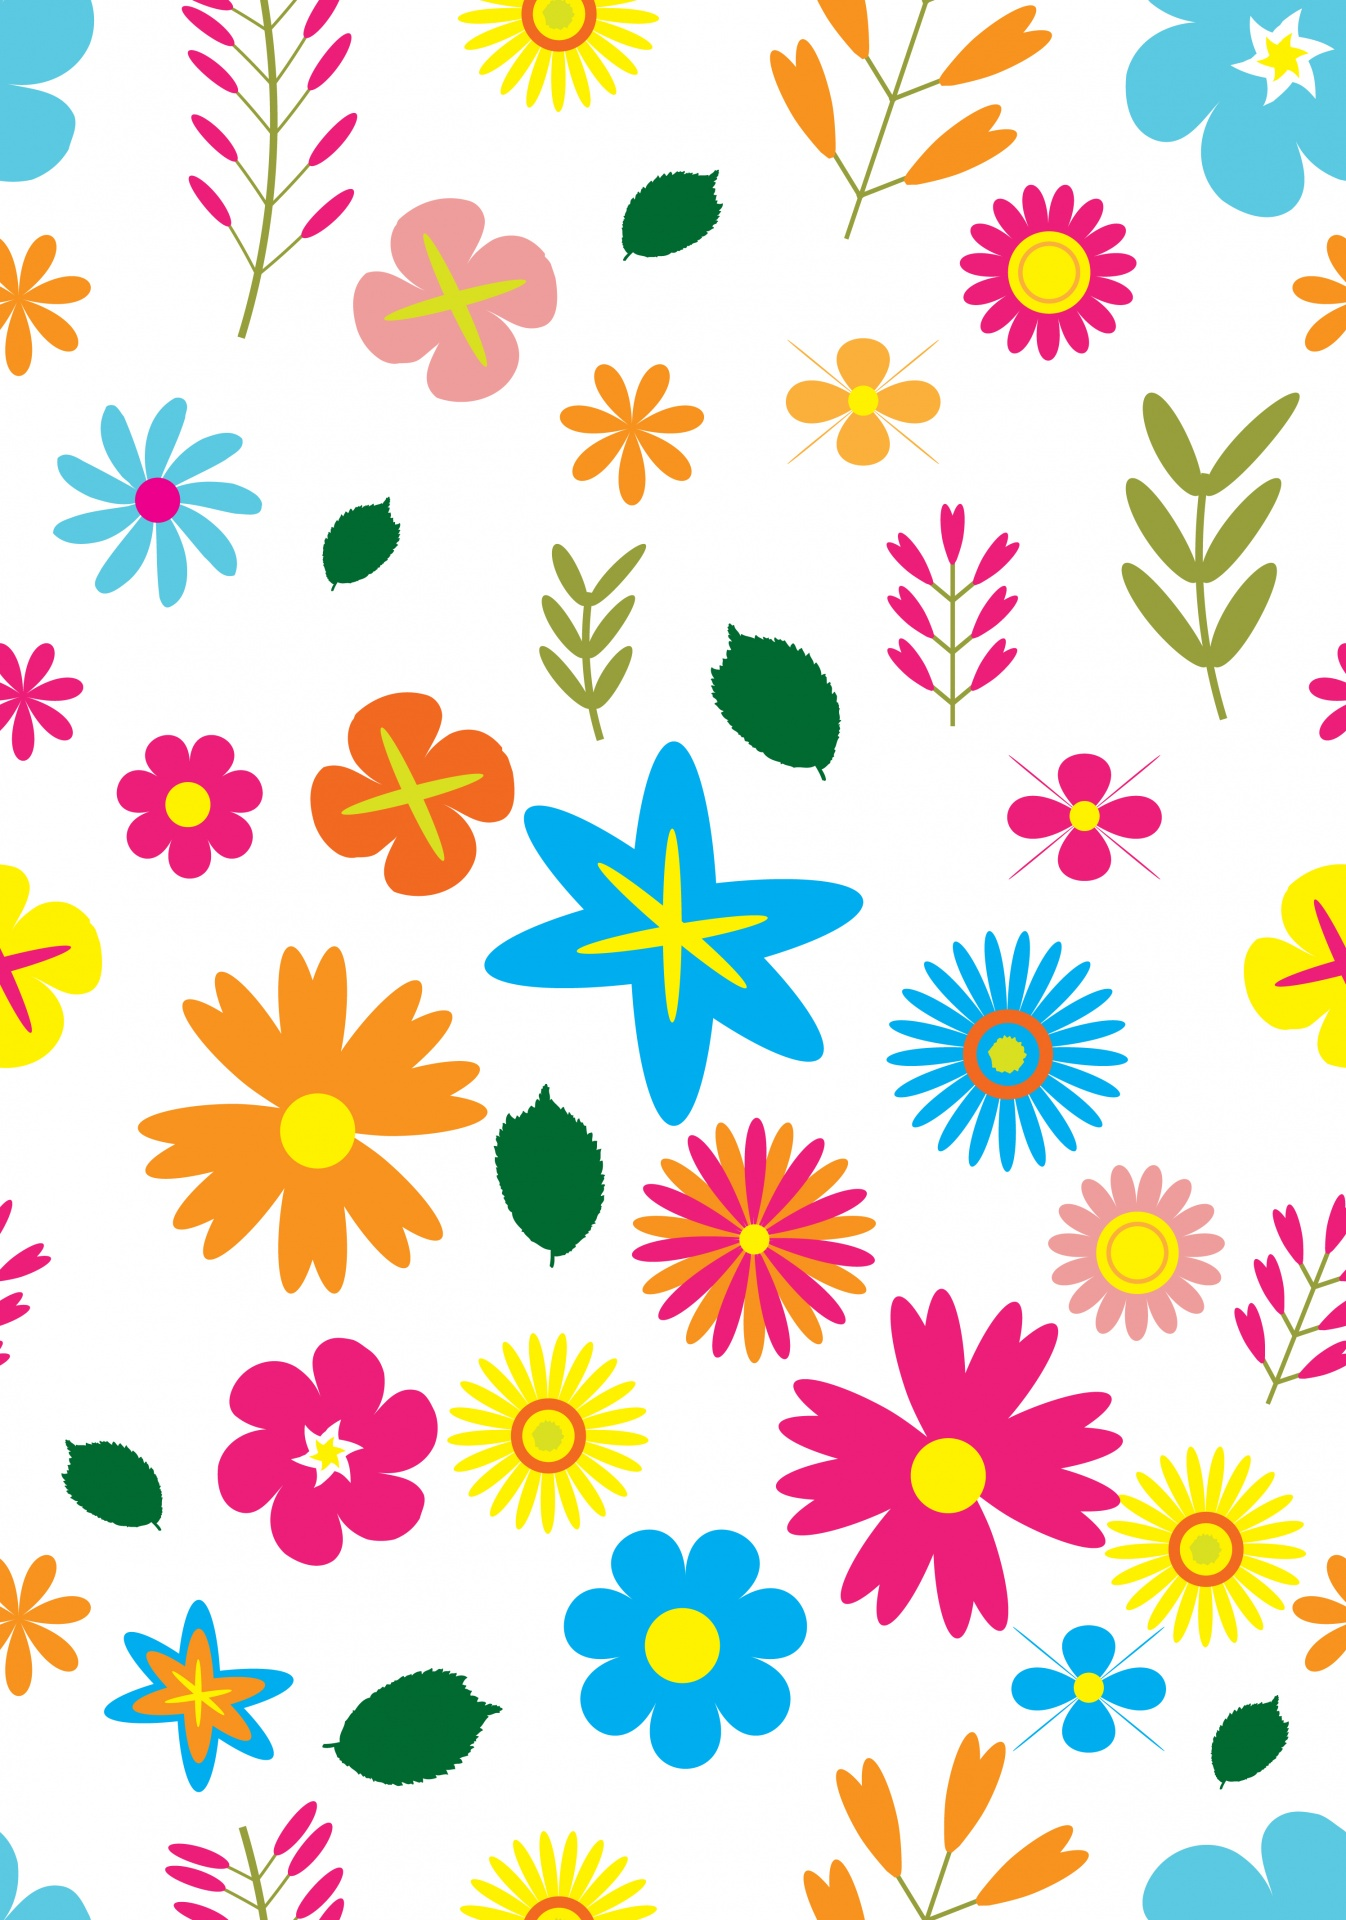 Wallpaper clipart images clip art transparent stock Floral Flowers Flower Free Picture - Flowers Wallpaper ... clip art transparent stock